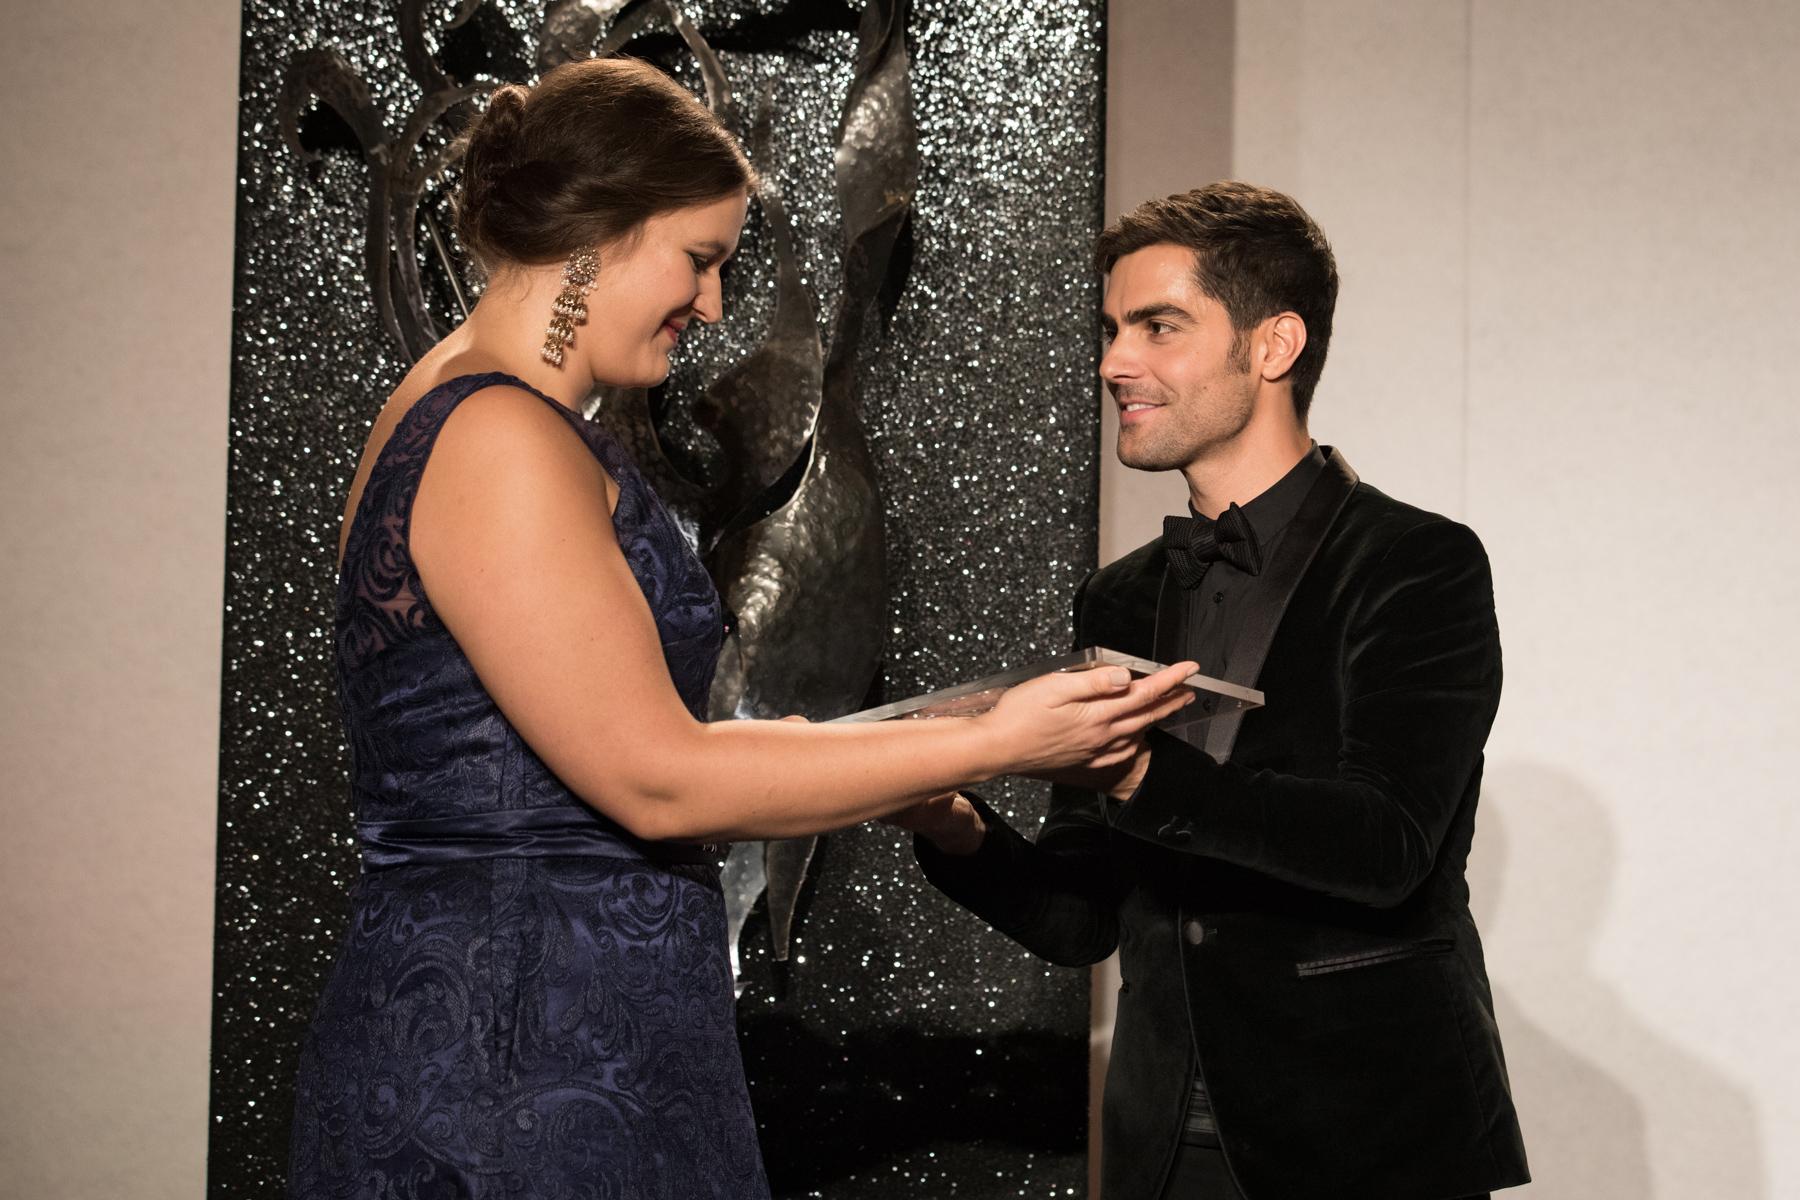 Miloš Karadaglić presents Lise Davidsen with her Young Artist of the Year Award